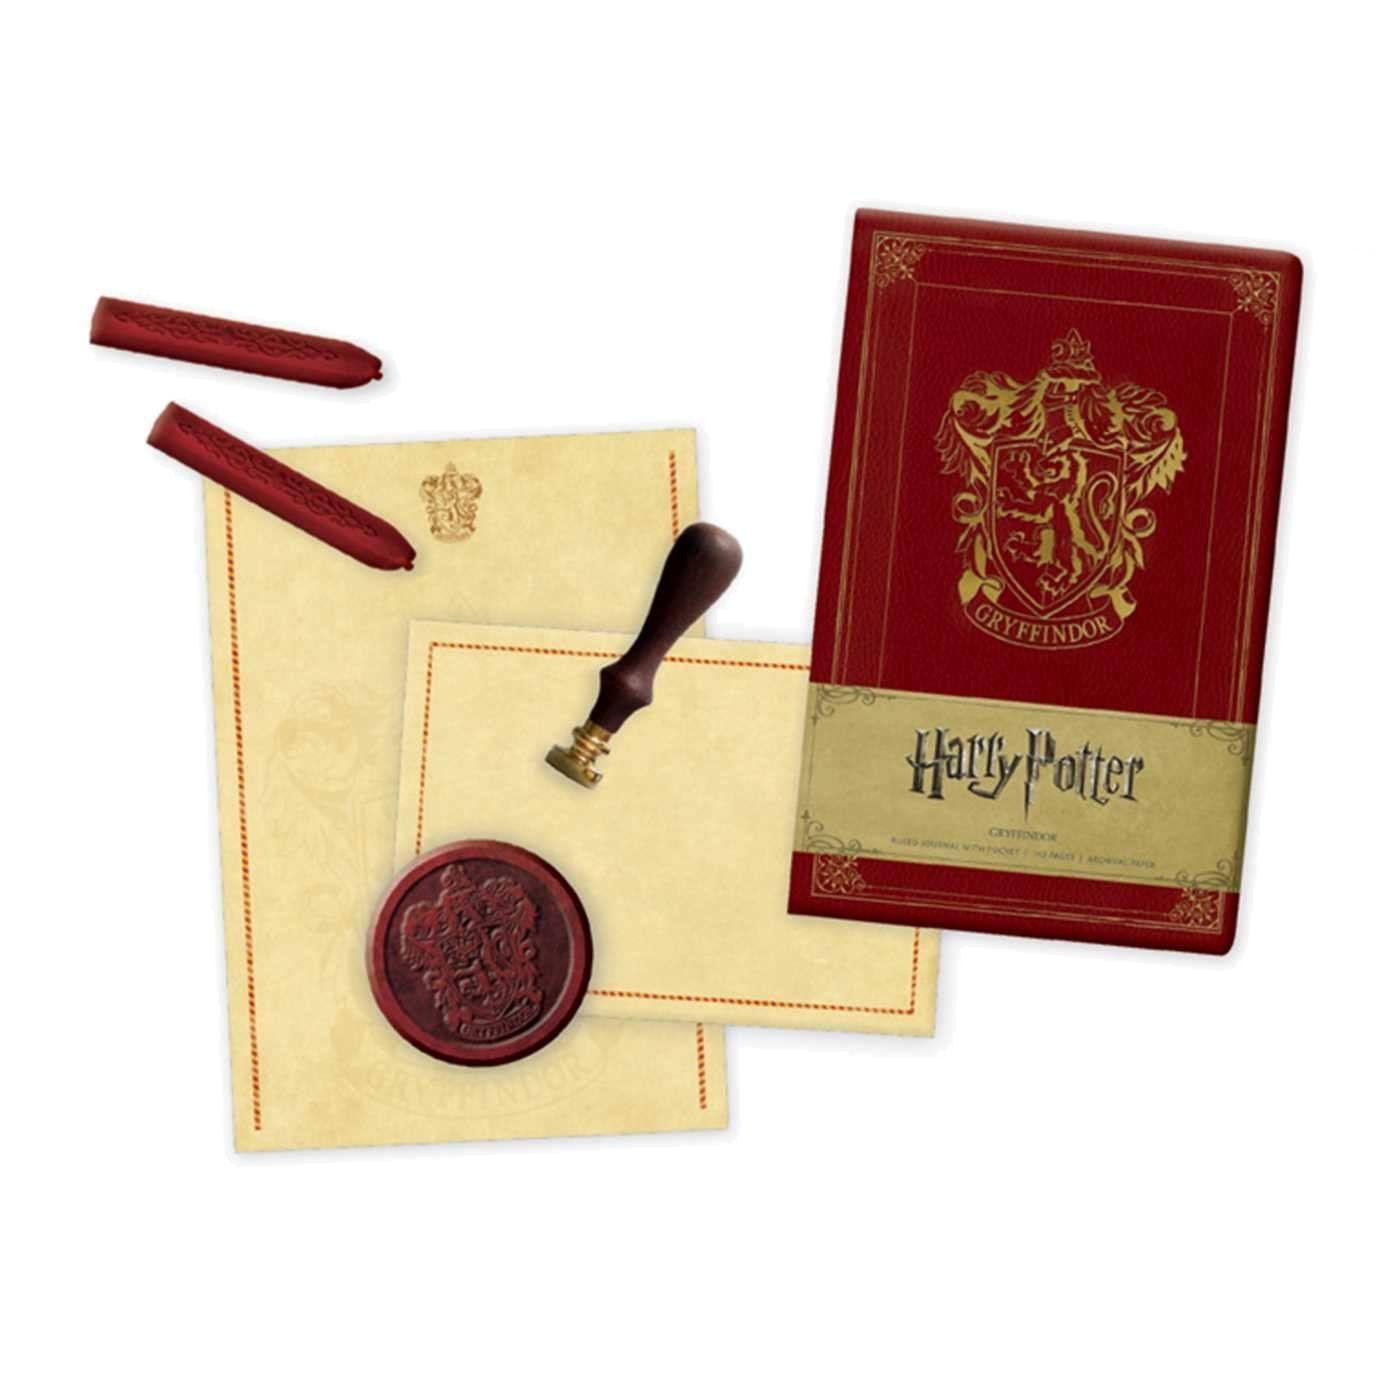 Harry Potter Deluxe Stationery Set Gryffindor